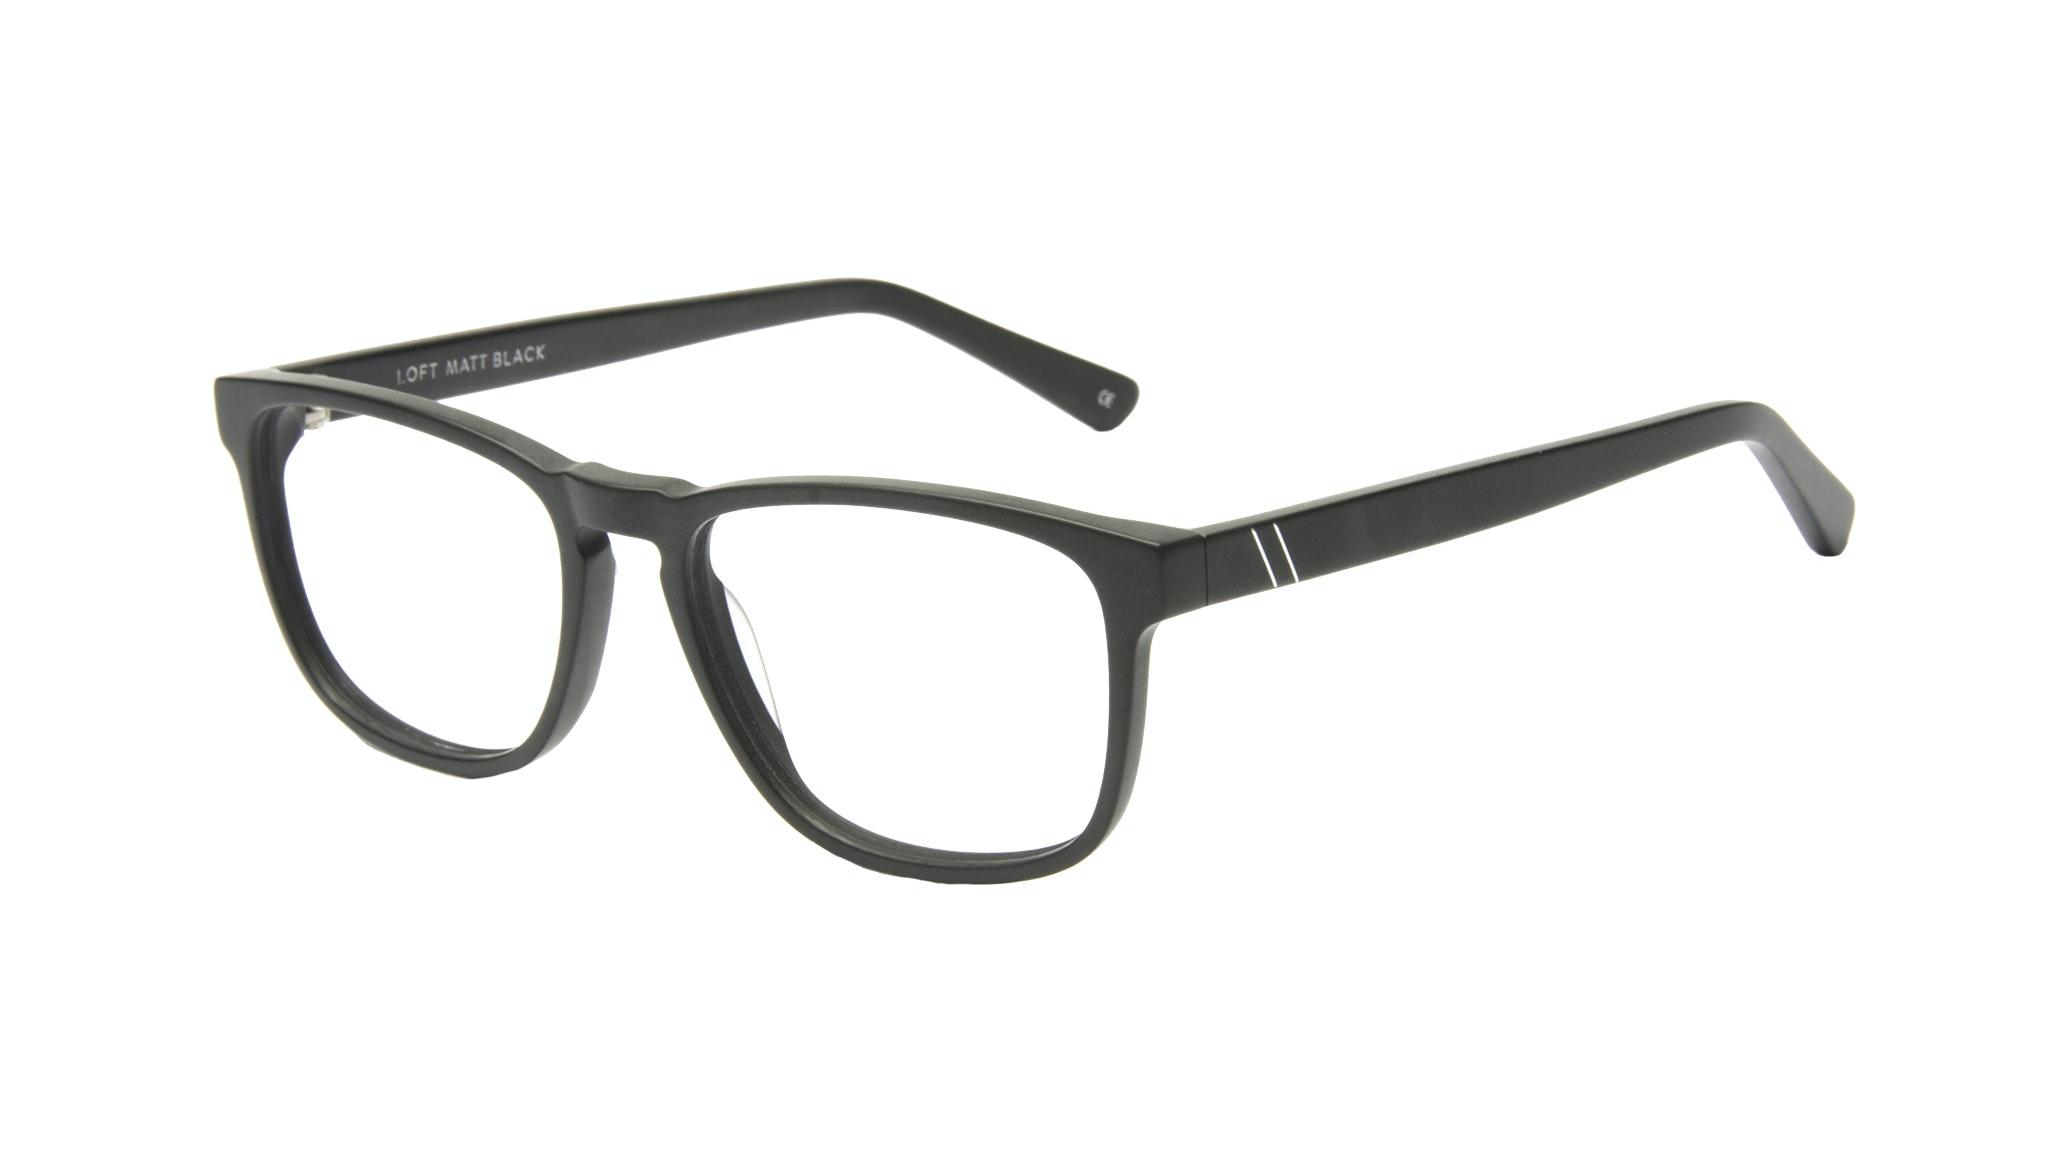 Affordable Fashion Glasses Rectangle Eyeglasses Men Loft Matte Black Tilt